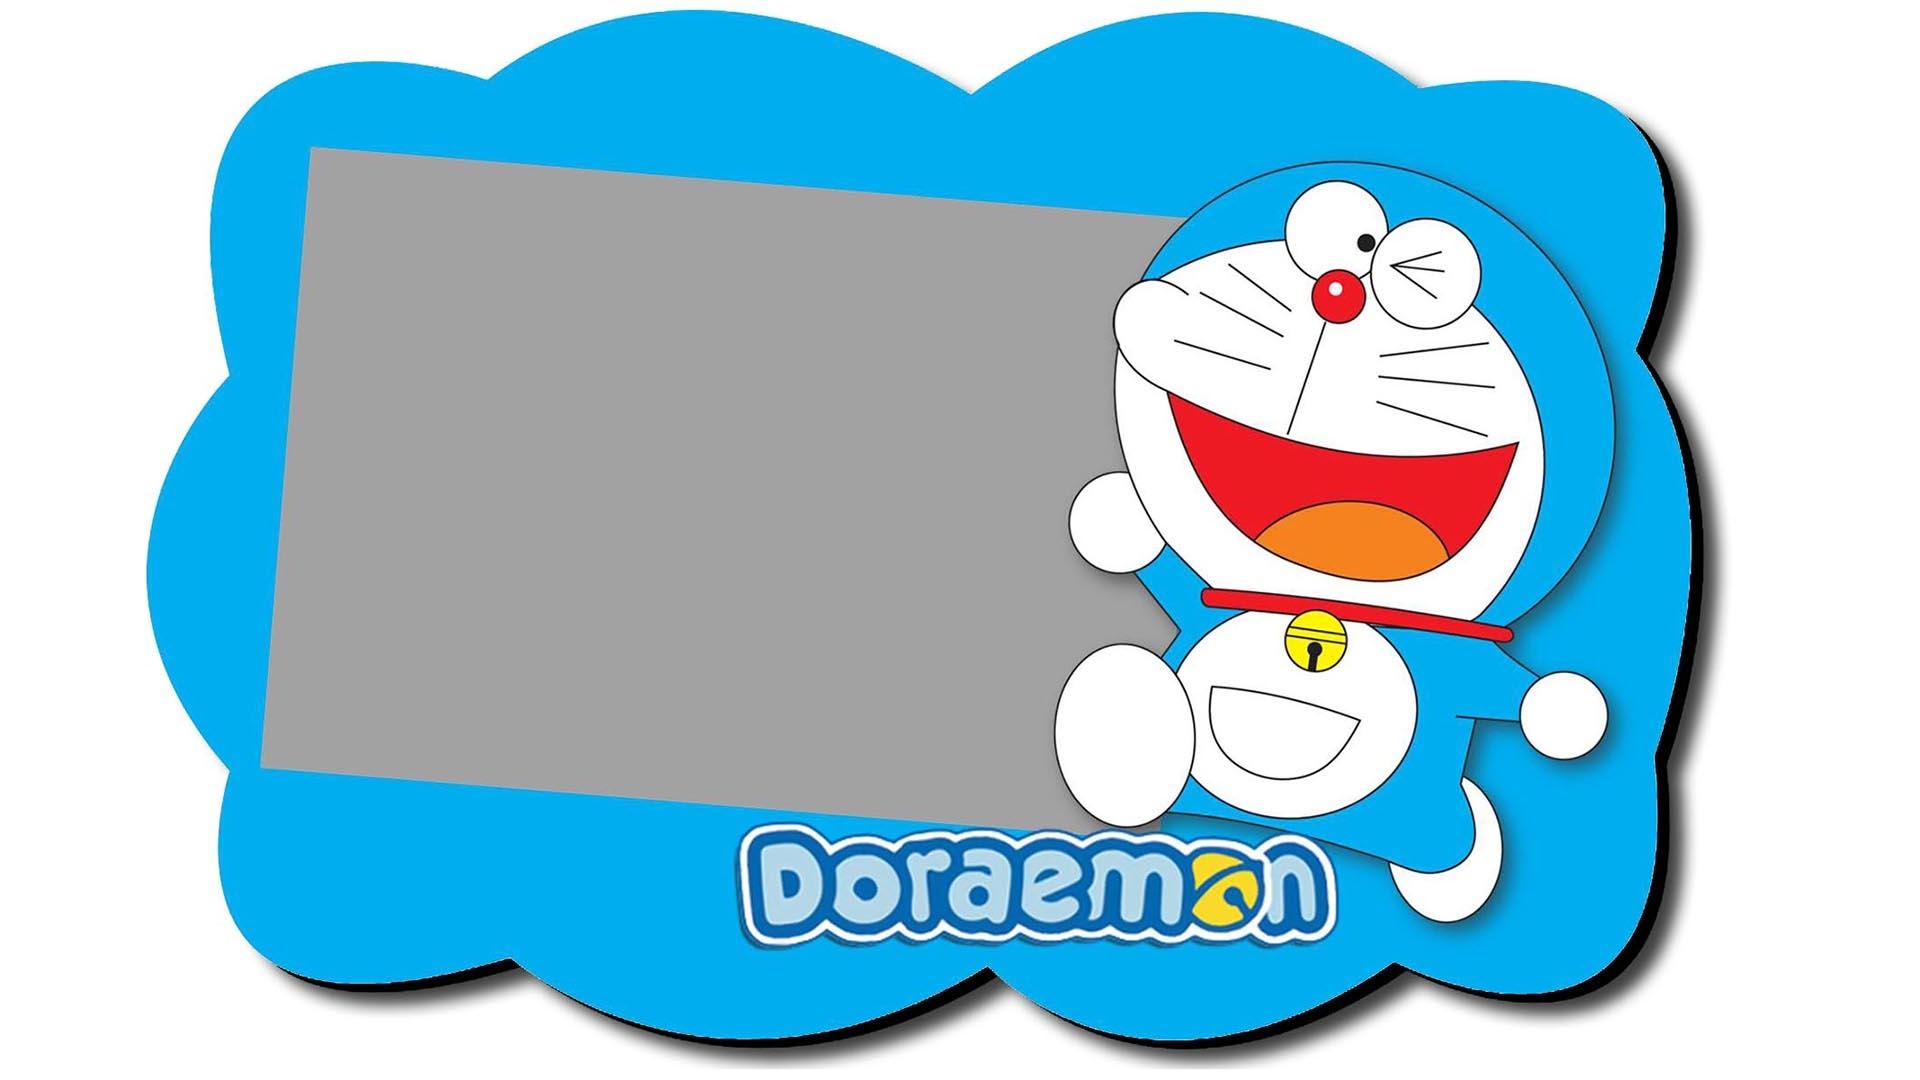 Free Download Doraemon Backgrounds  PixelsTalkNet